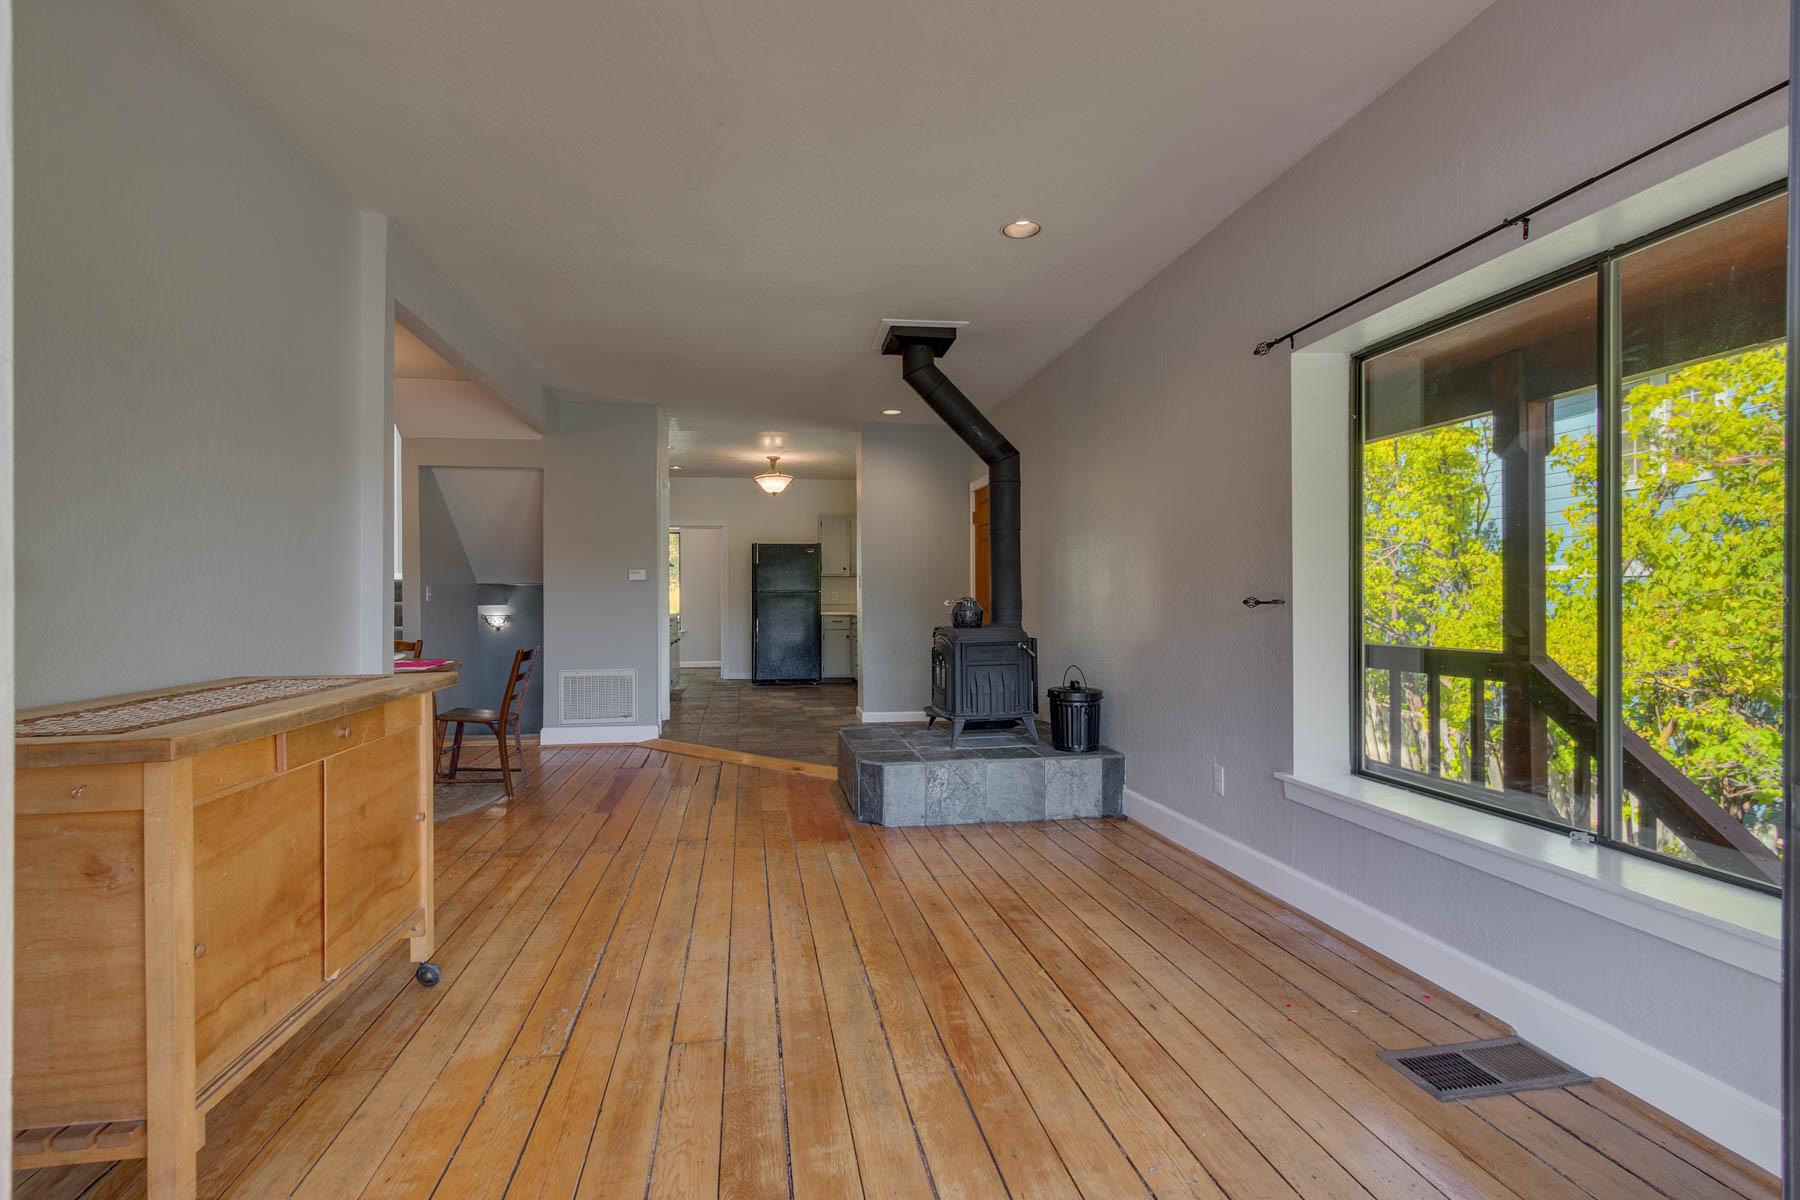 Additional photo for property listing at 10190 Keiser Ave., Truckee, CA 10190 Keiser Ave. 特拉基, 加利福尼亚州 96161 美国